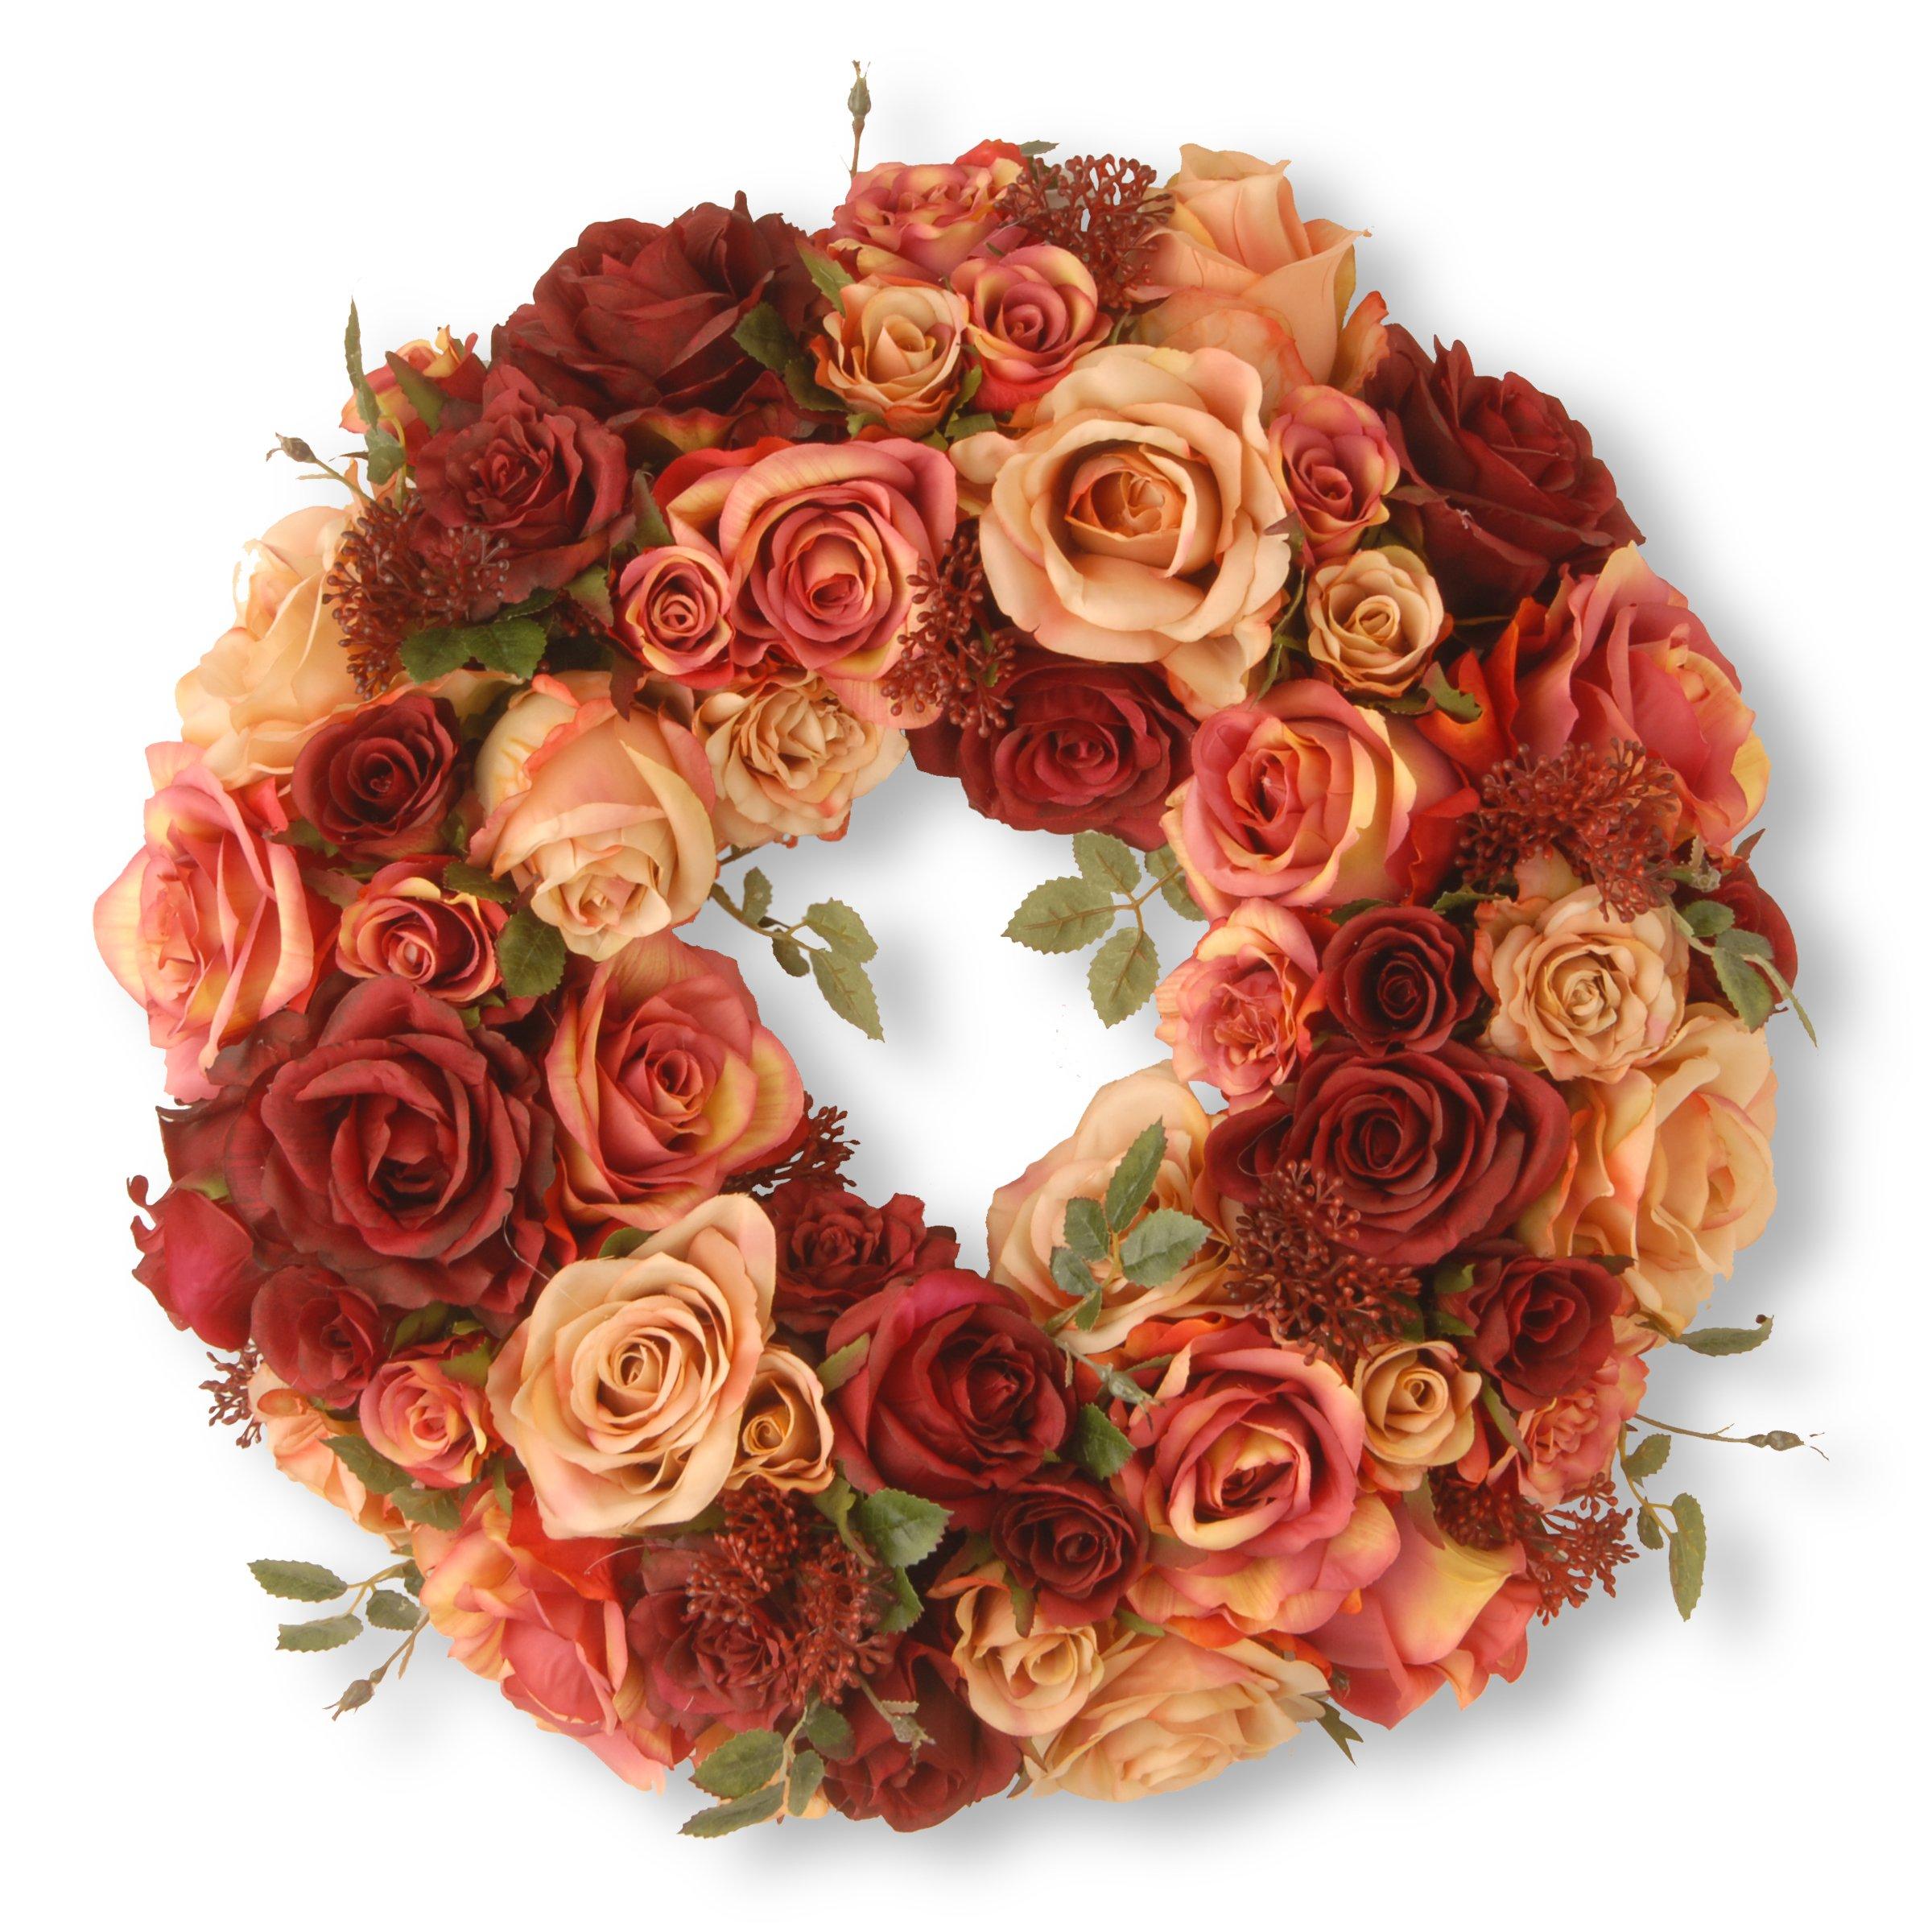 National Tree 15.5 Inch Mixed Roses and Skimmia Wreath (RAV-WL80693-1)